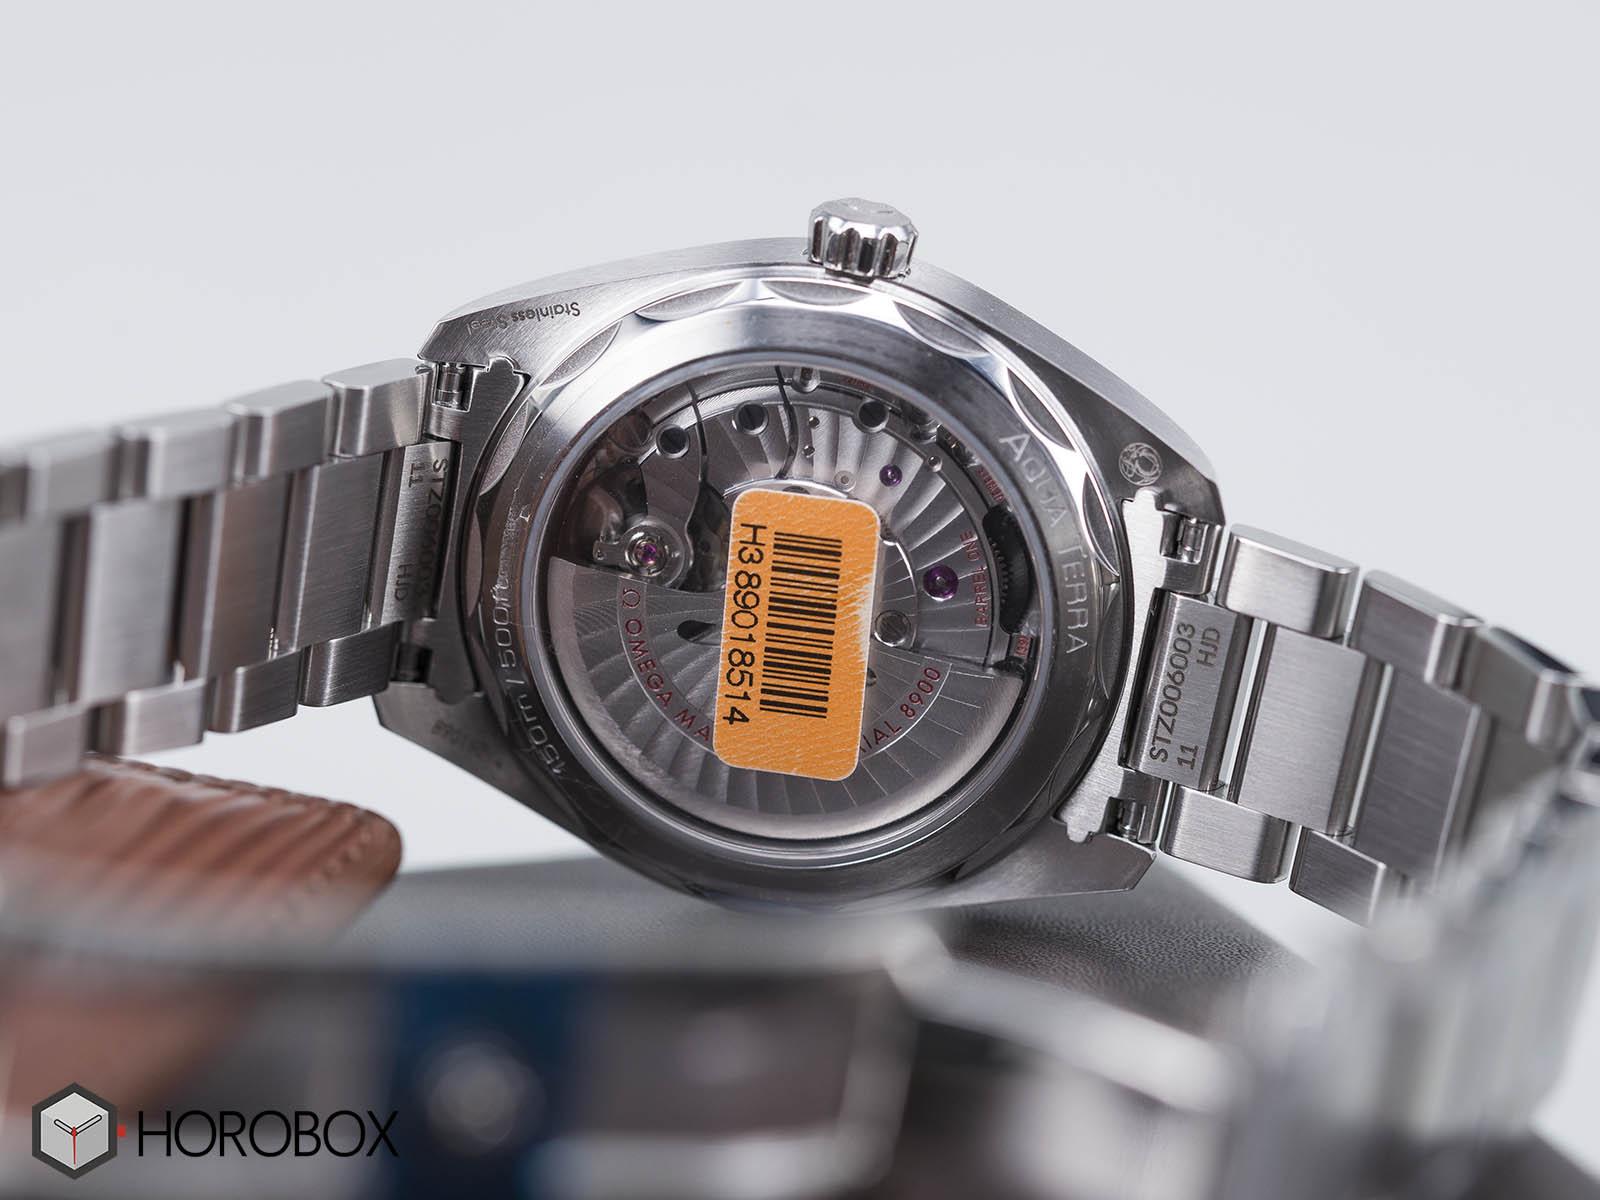 omega-seamaster-aqua-terra-150m-220-10-41-21-01-001-7-.jpg